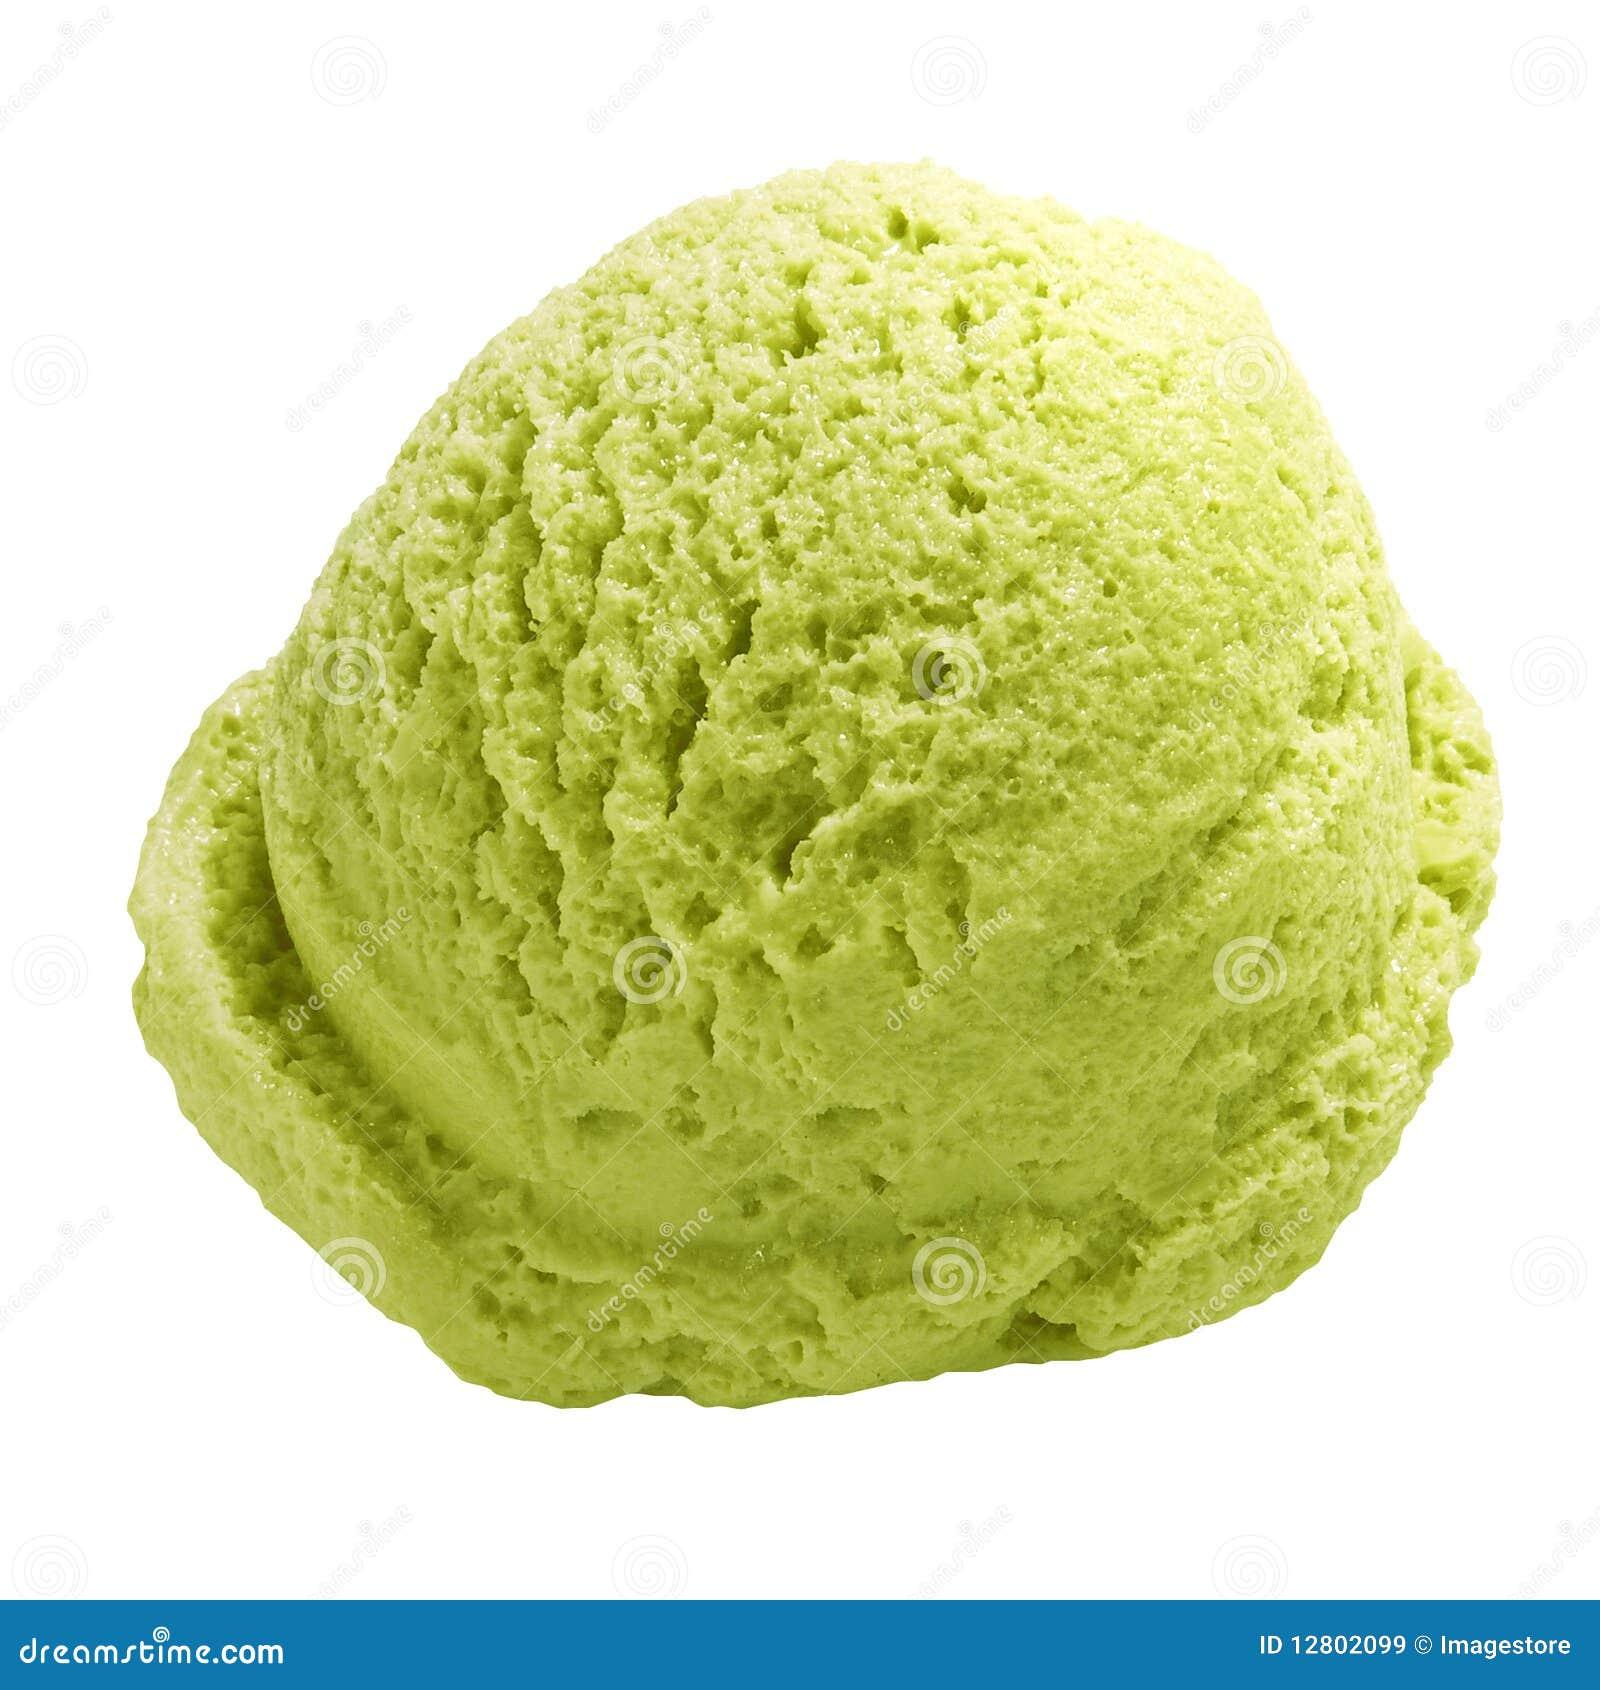 ... avocado green pistachio ice cream pistachio cream pistachio ice cream